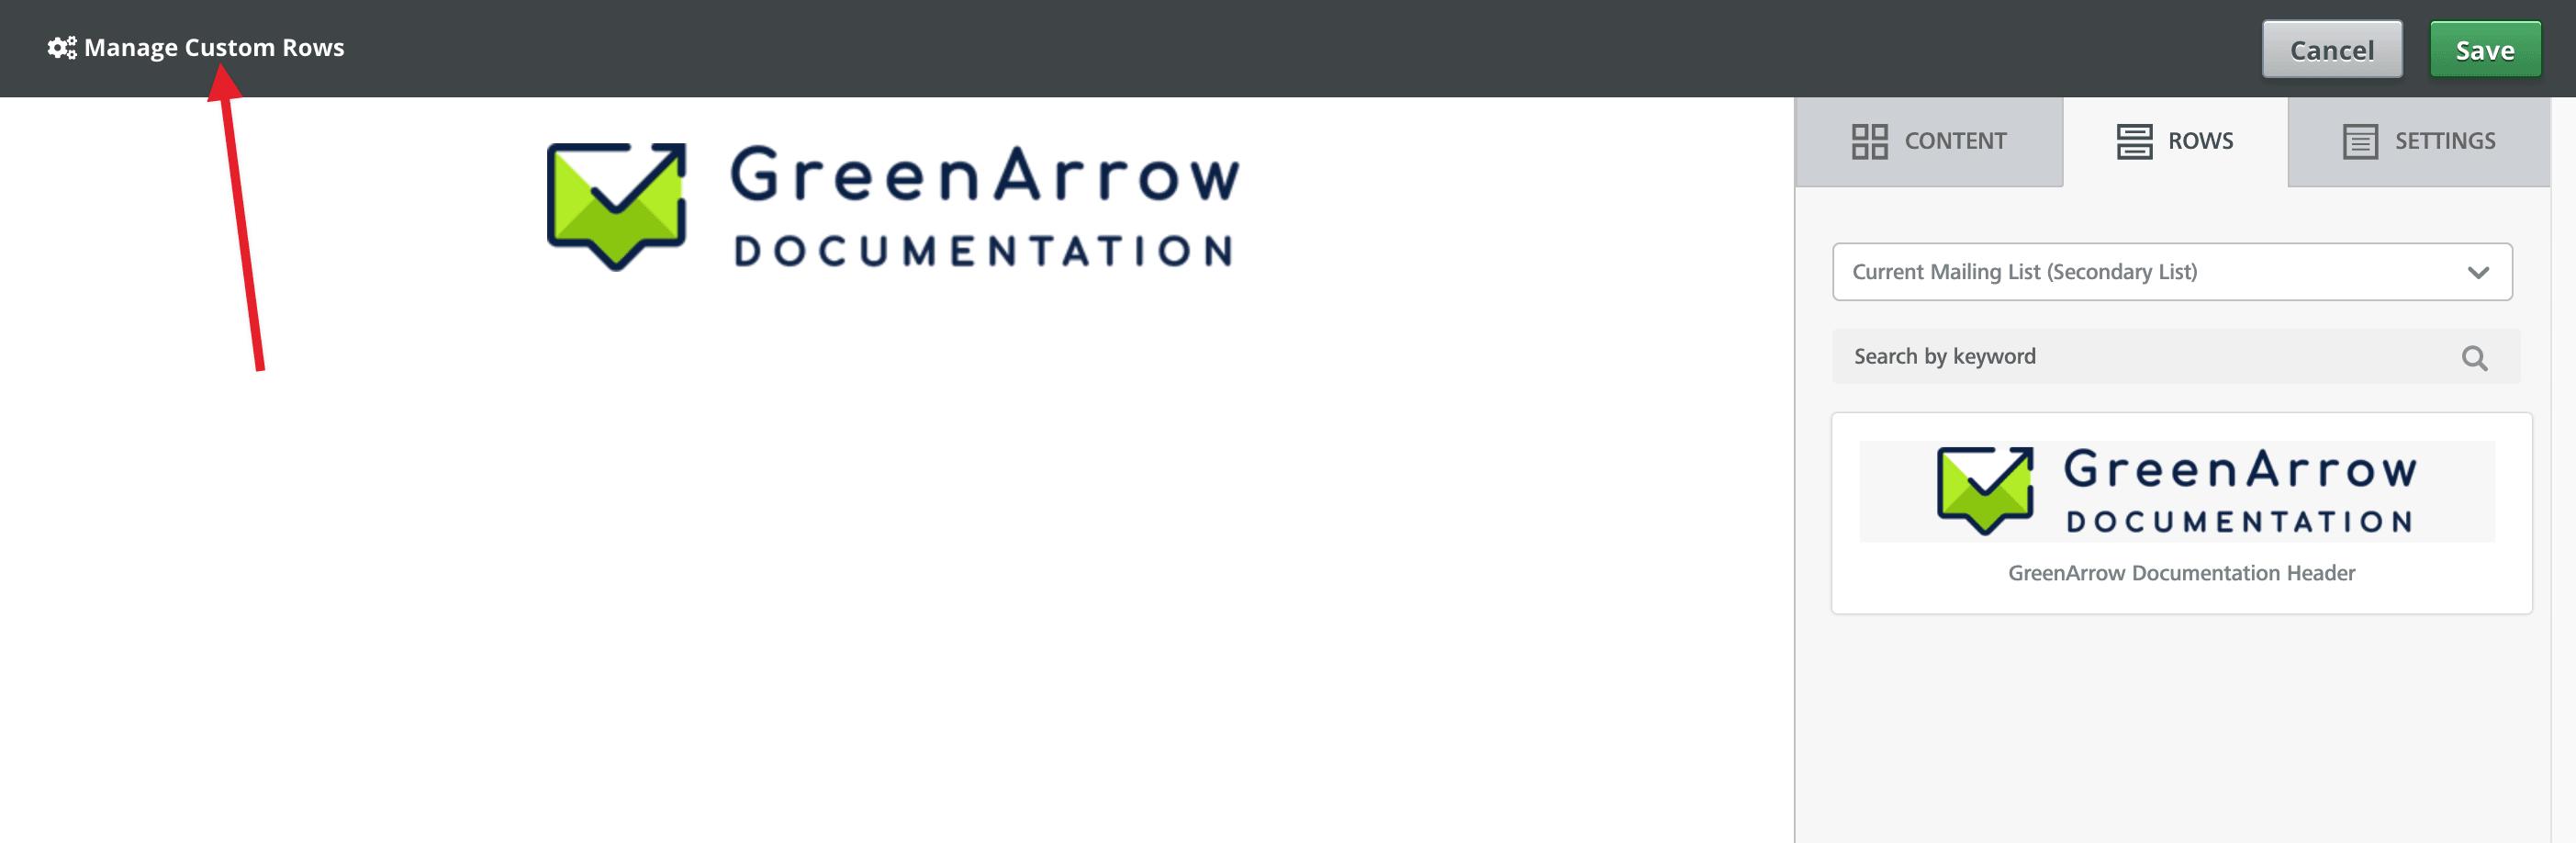 manage-custom-rows-link